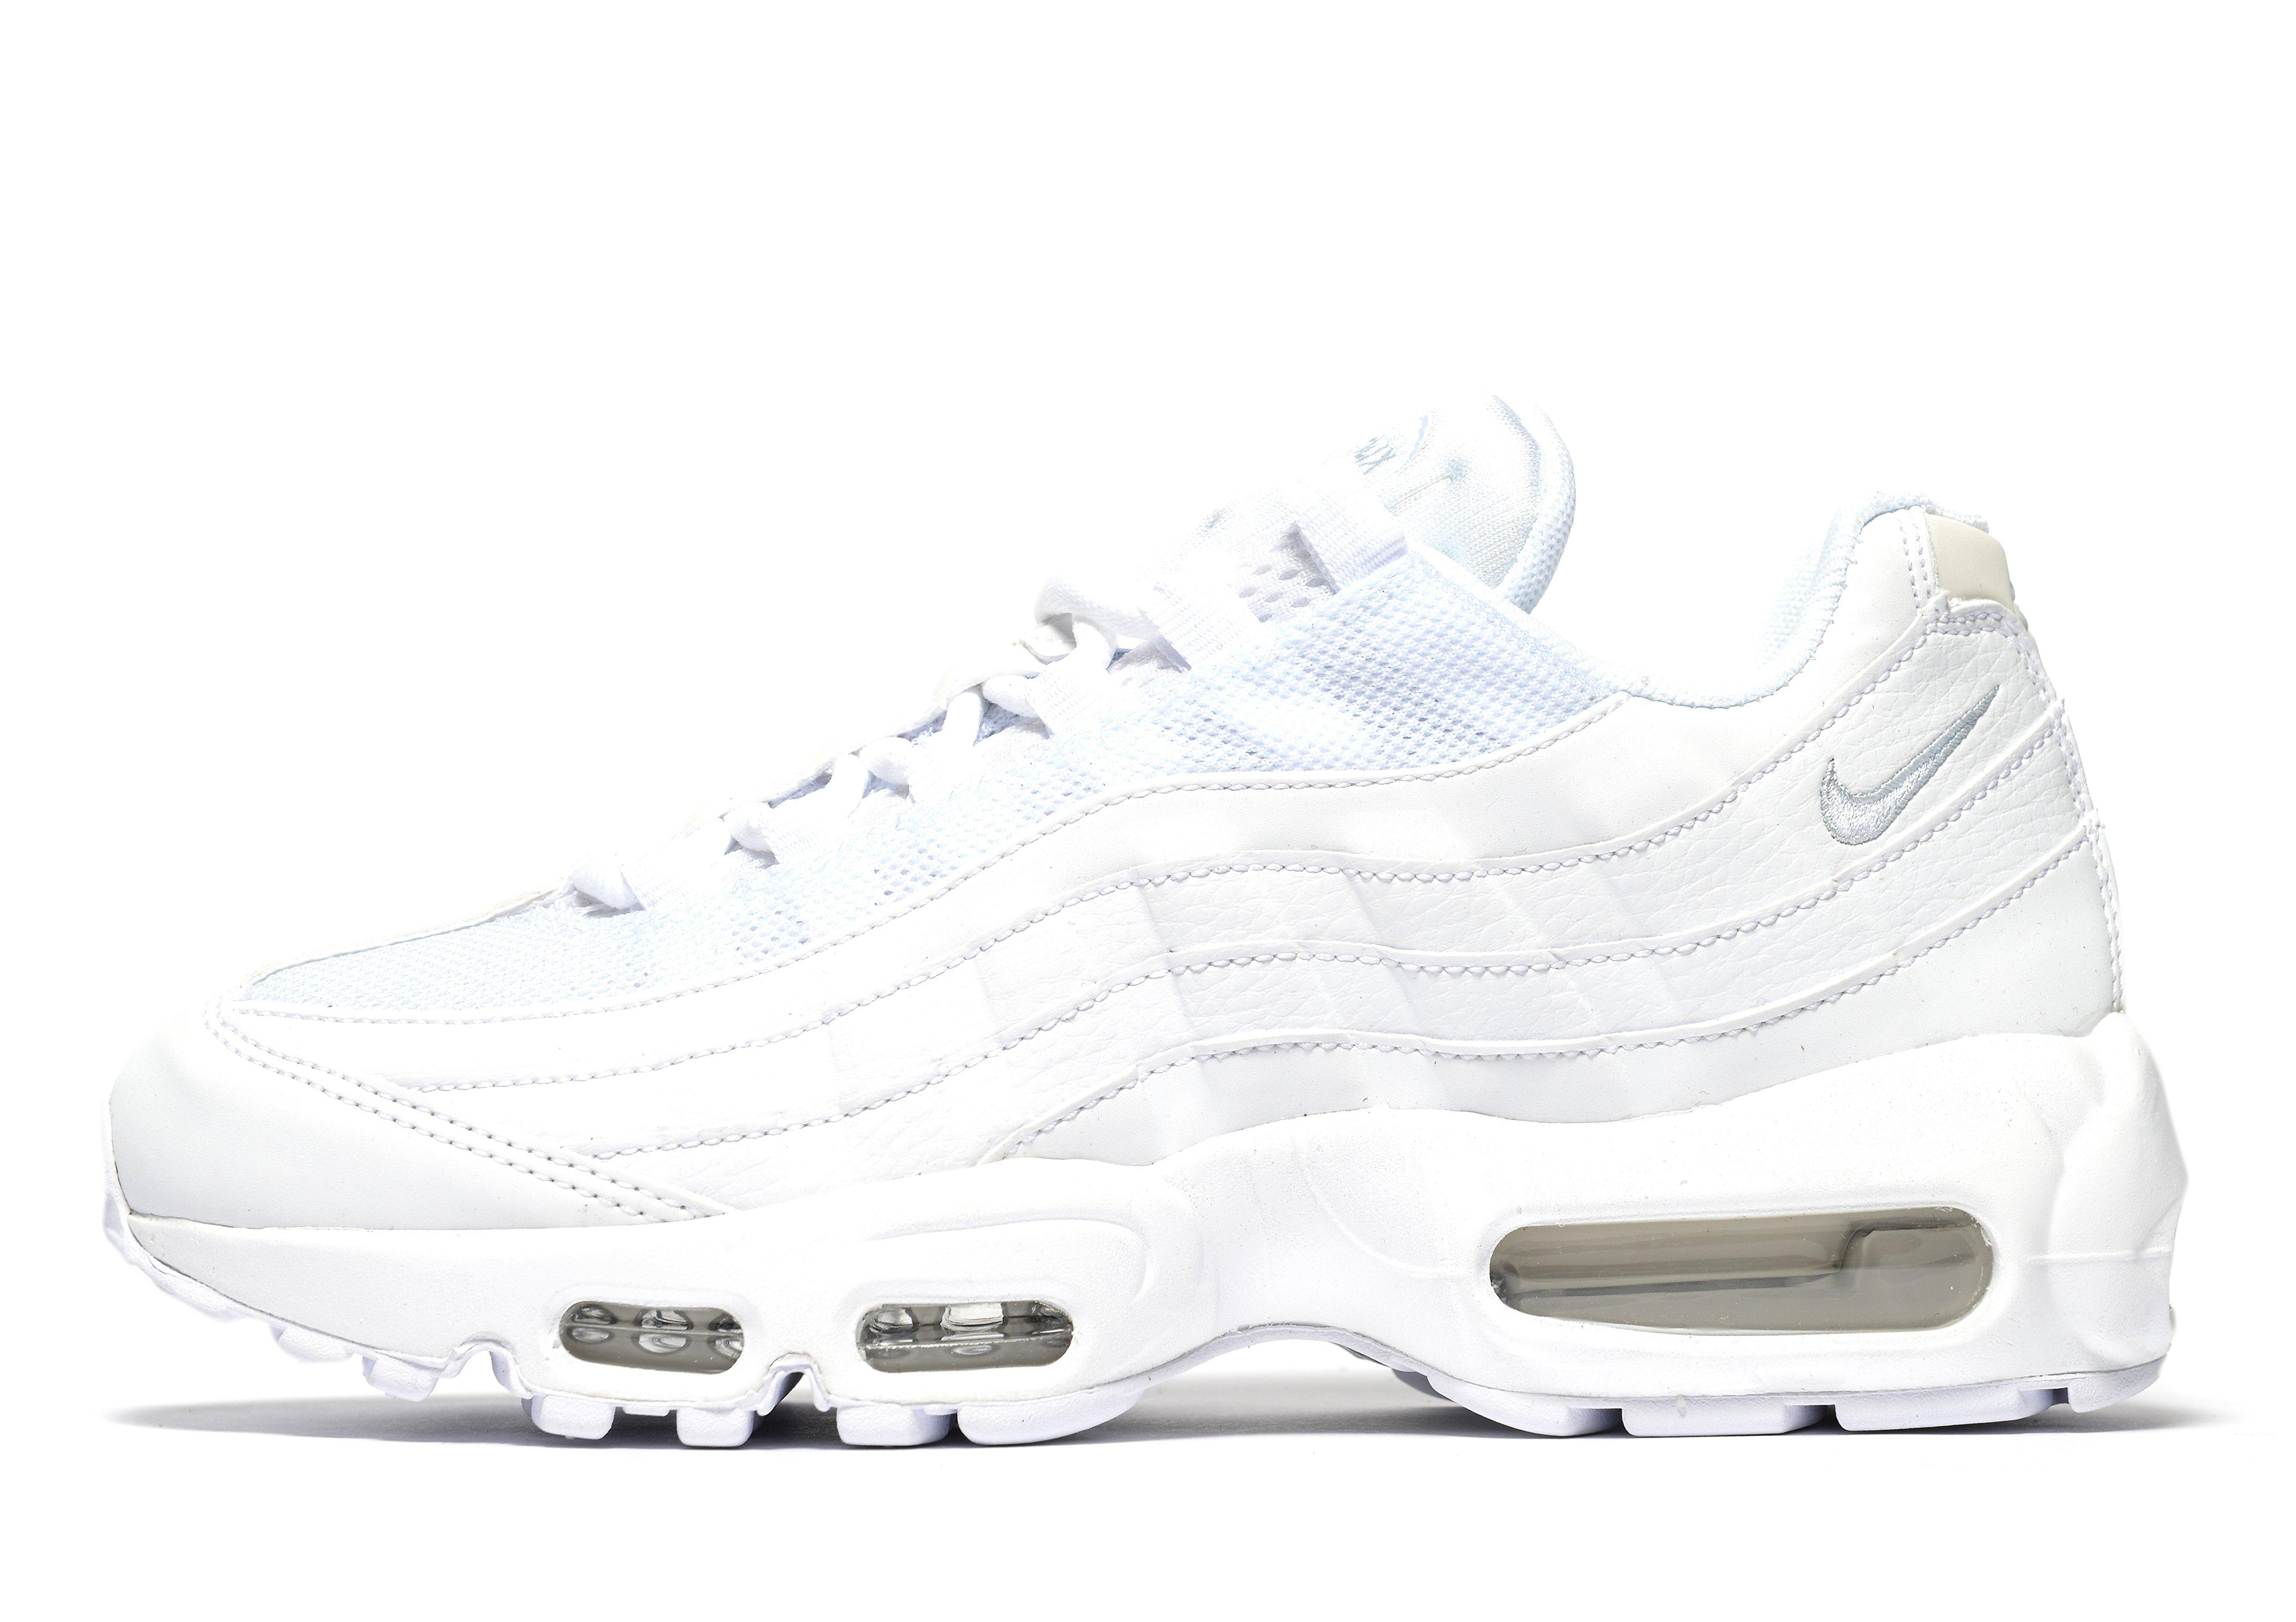 Nike Air Max 95 Toutes Les Chaussures De Tennis De Femmes Blanches